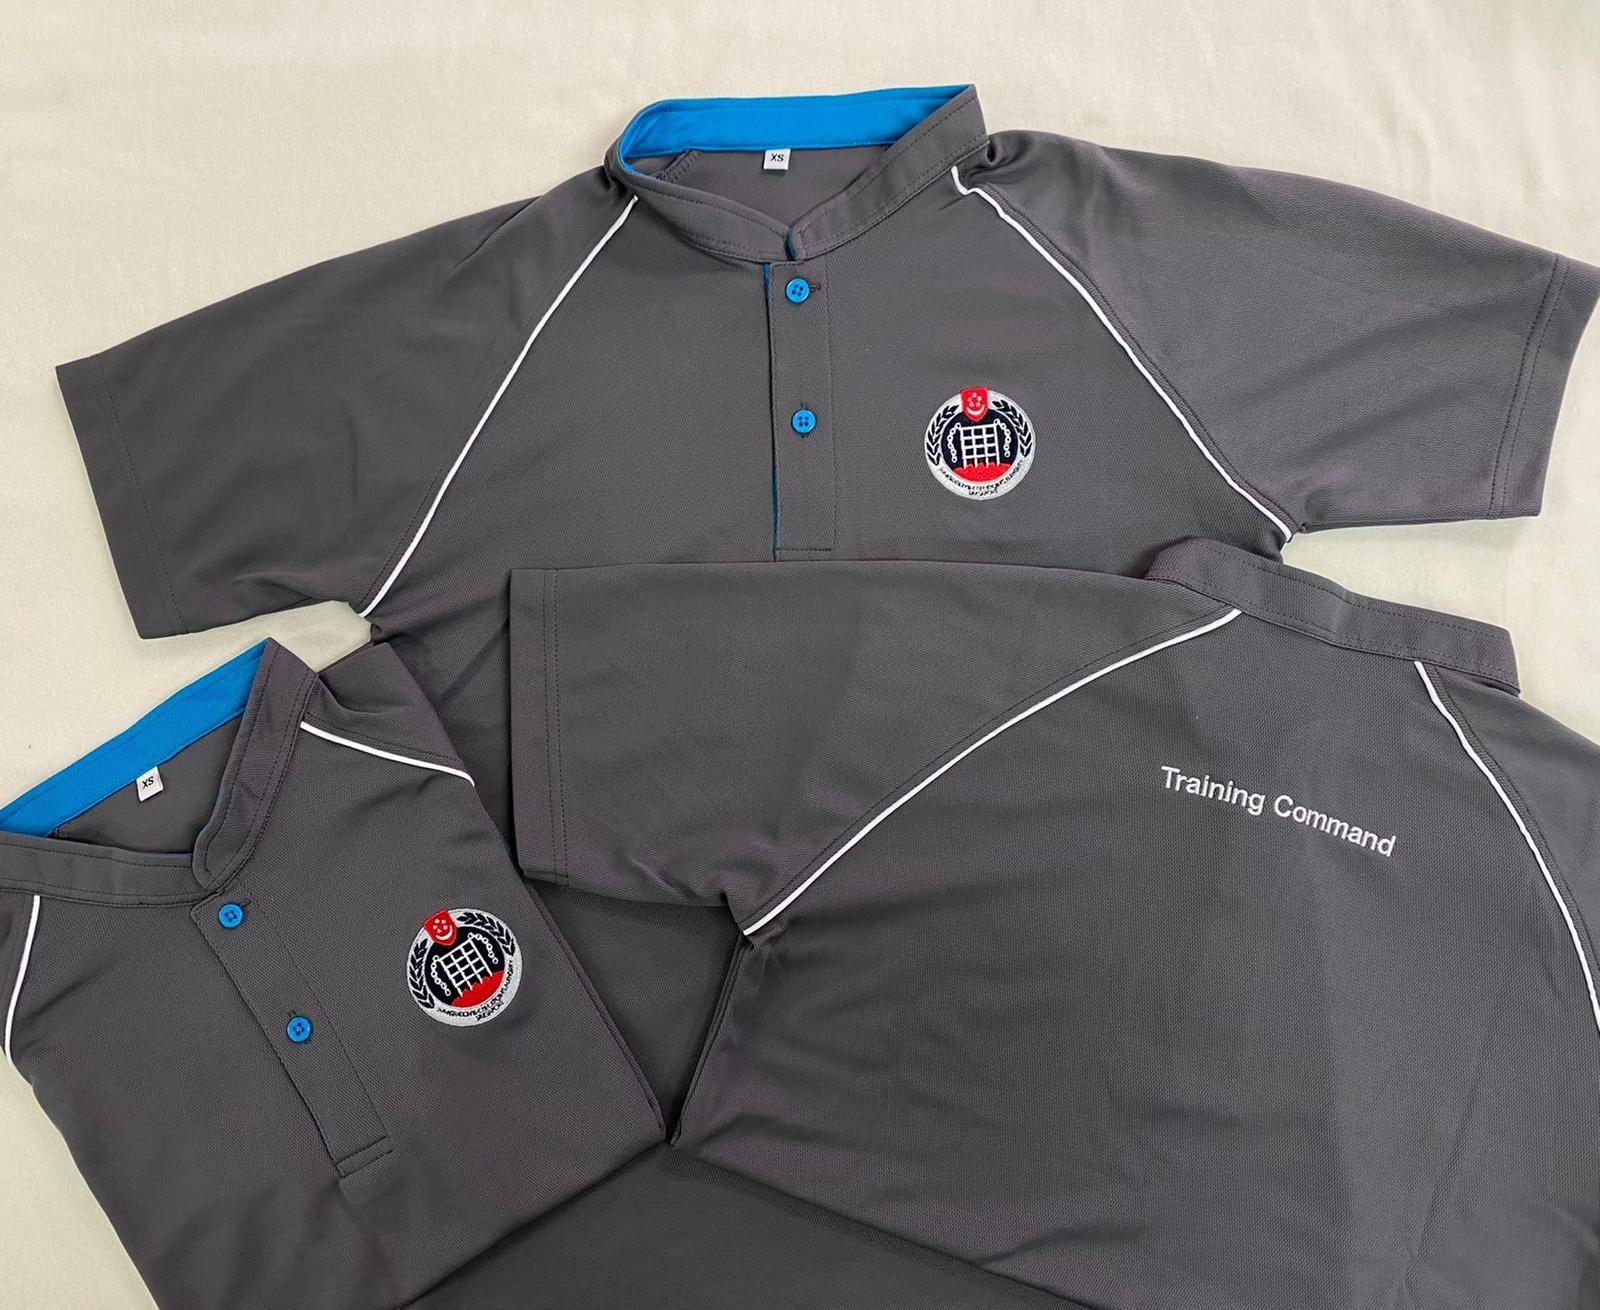 Company Uniform – Training Command